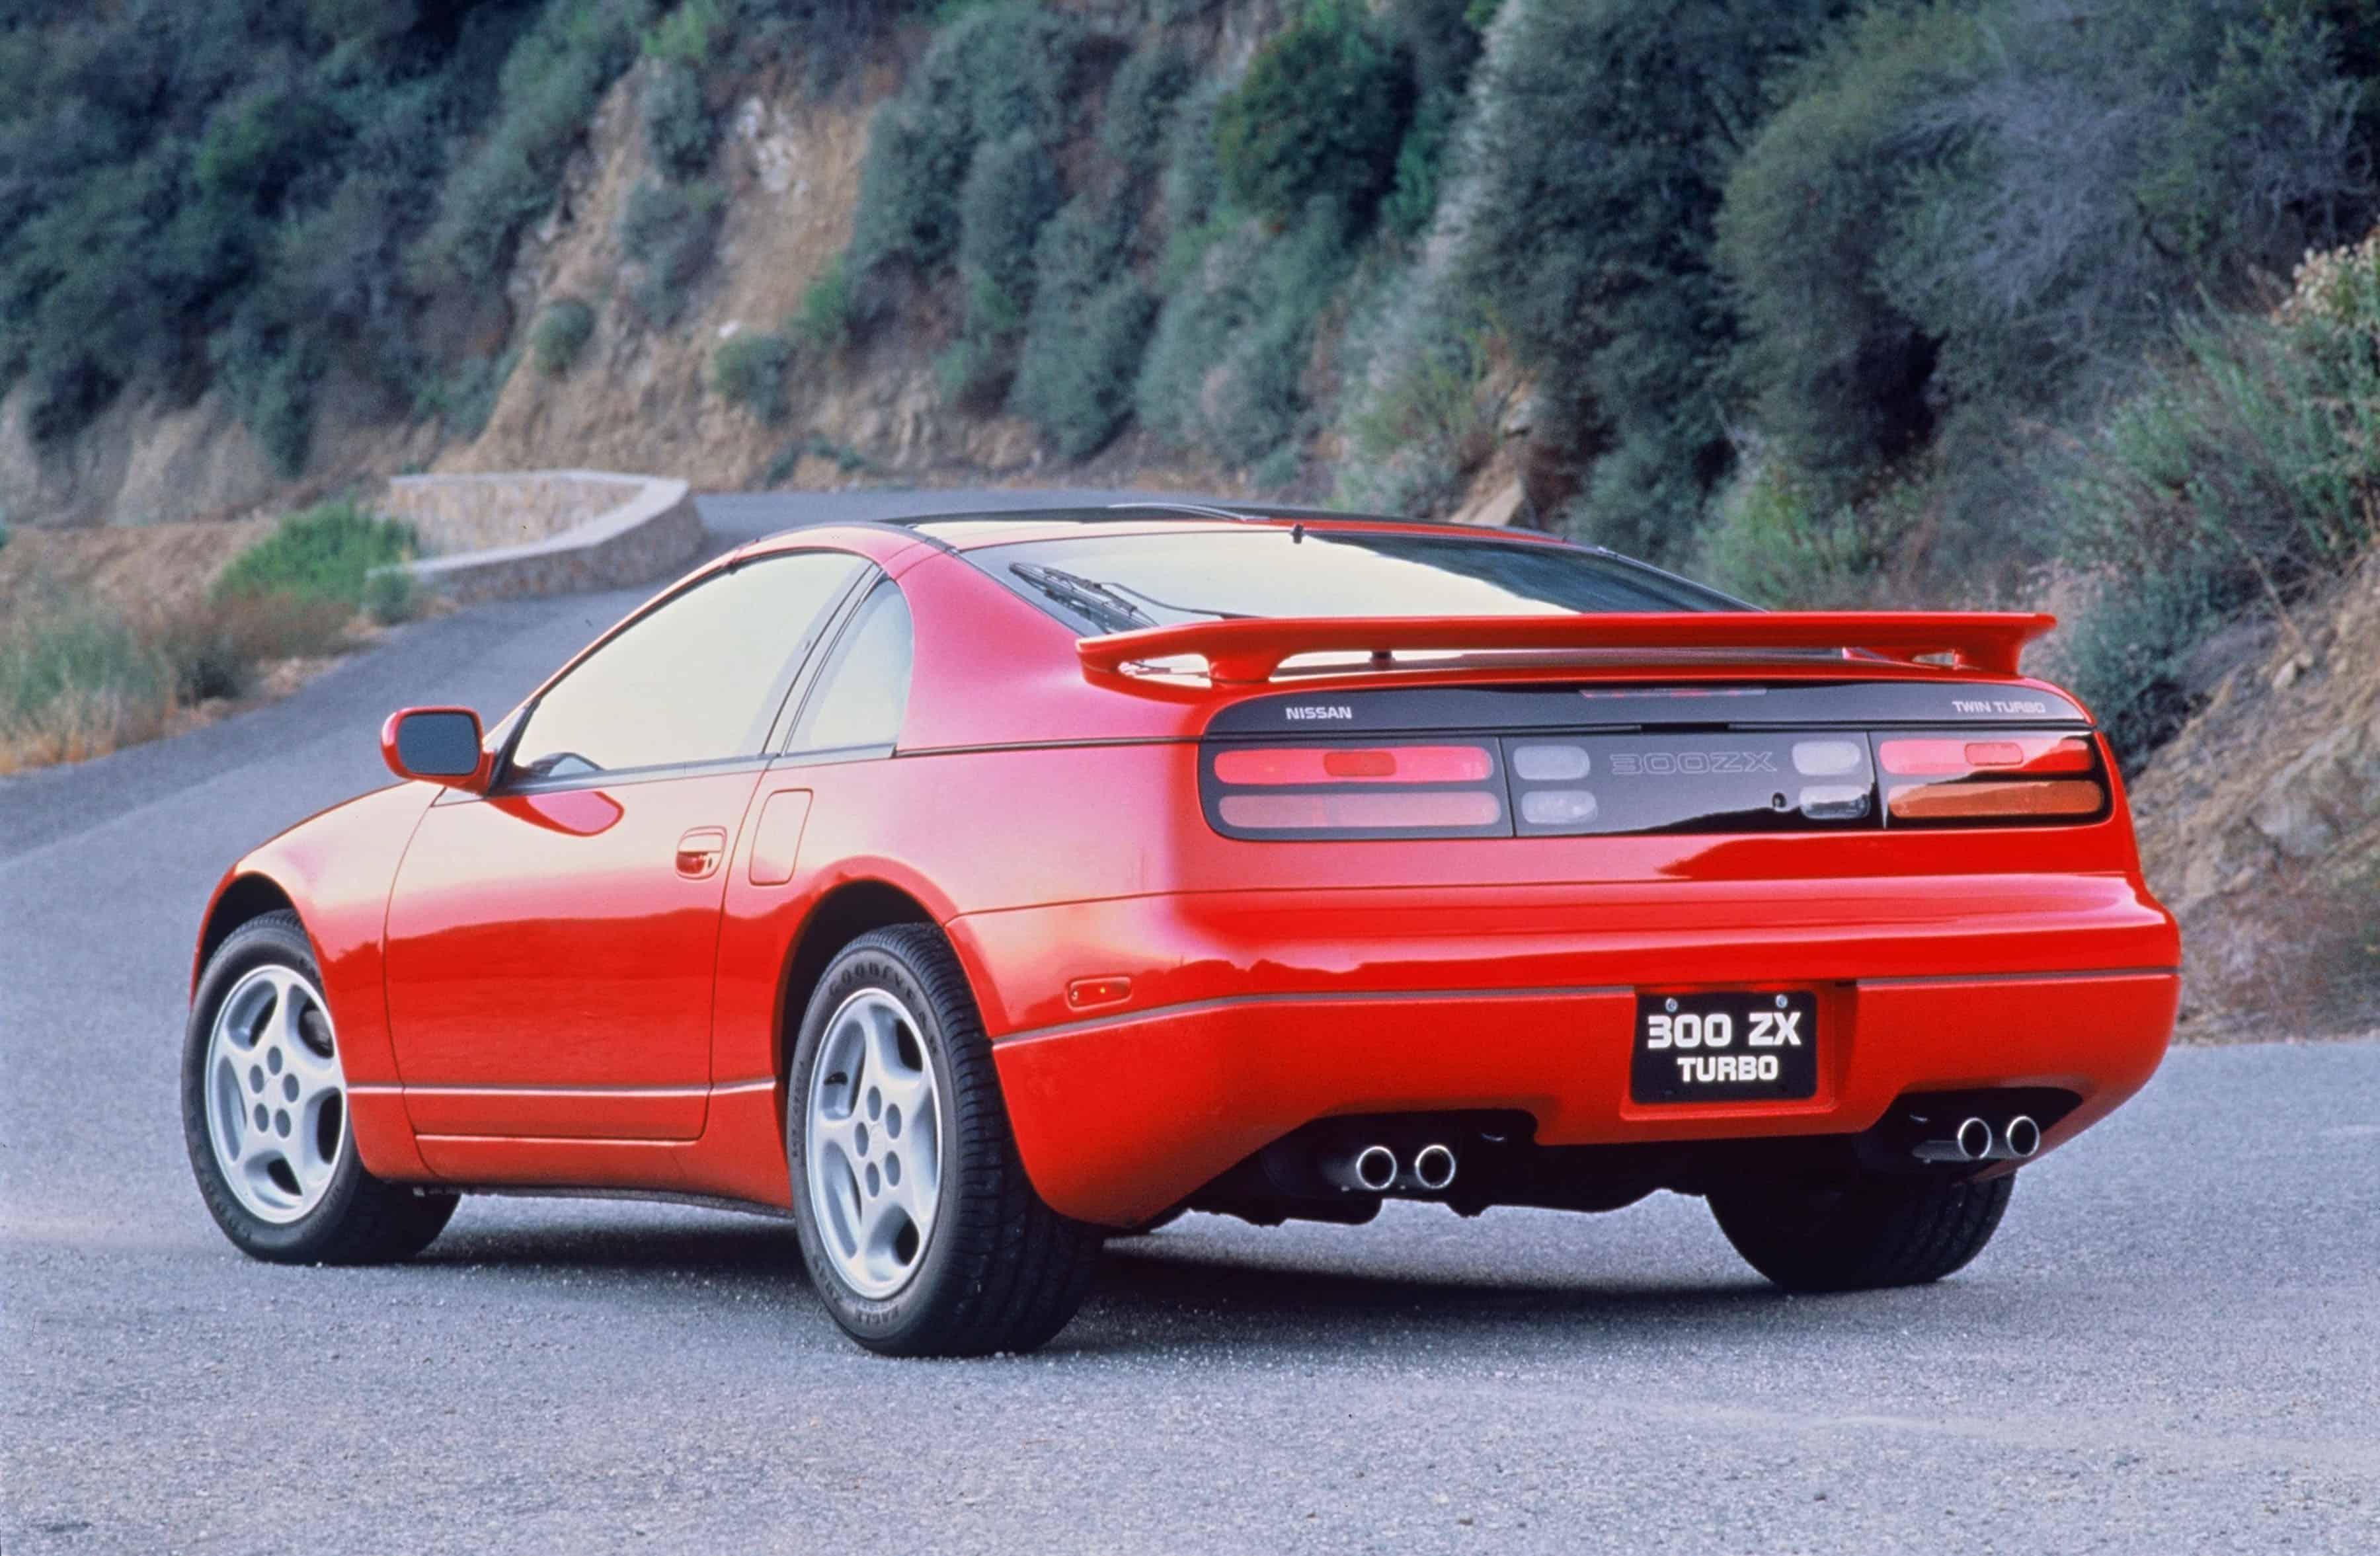 Nissan 300ZX - left rear view